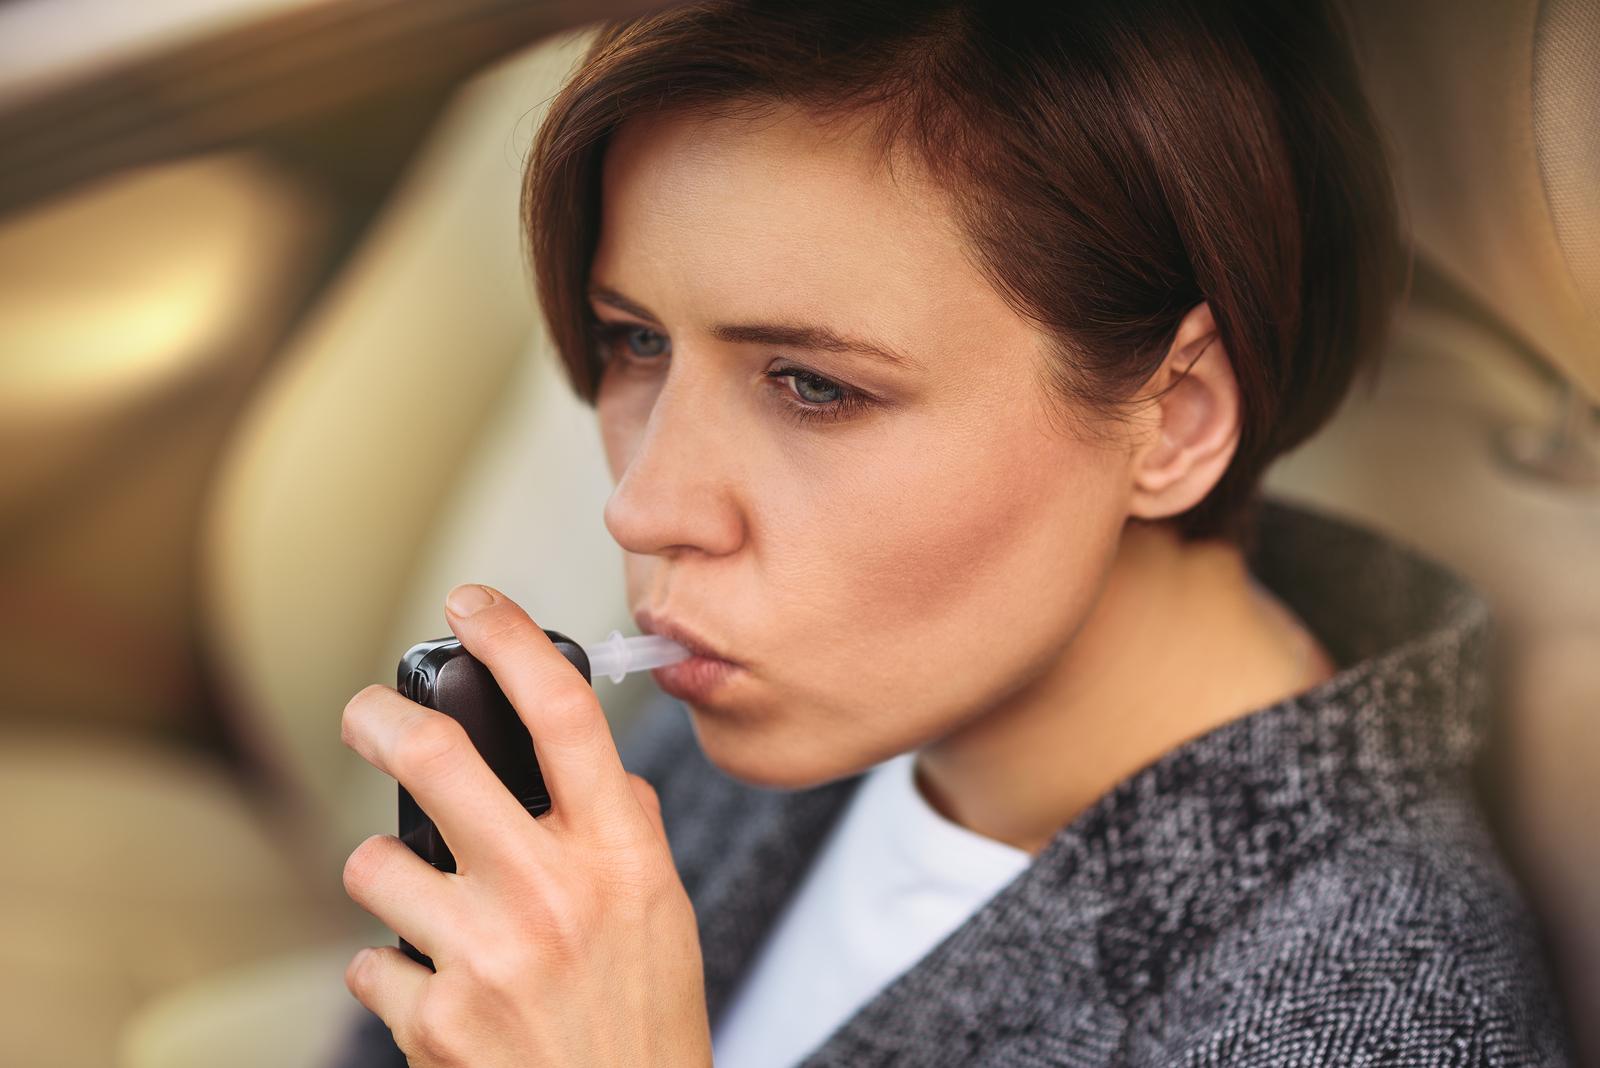 bigstock-Woman-Using-Breath-Alcohol-Ana-262022317.jpg